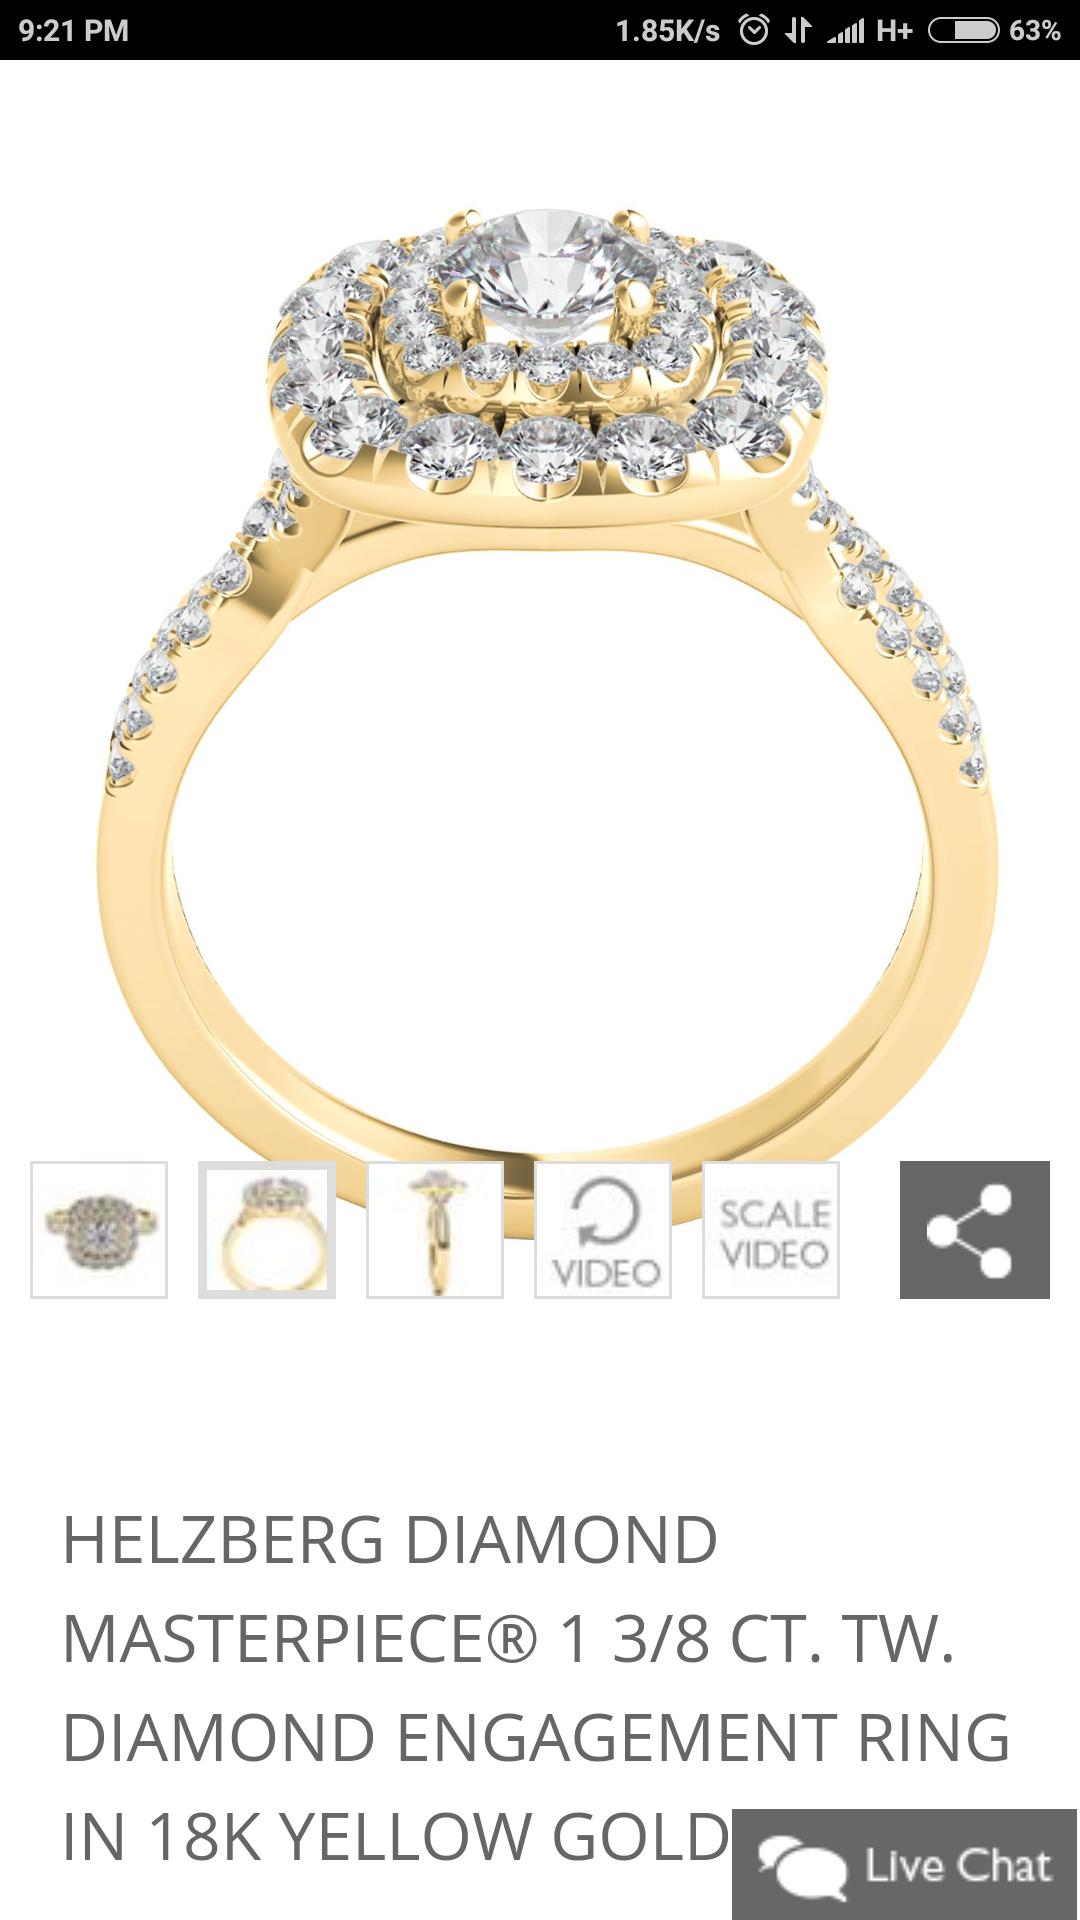 1.00ctw Helzberg Diamond Masterpiece Engagement Ring (GIA